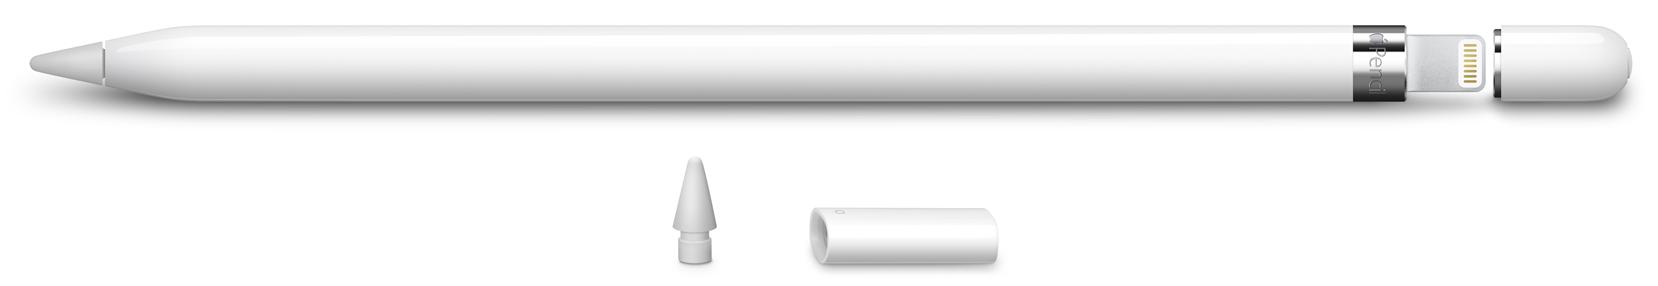 ipad pro acc apple pencil witb pdp 201603?wid=1658&hei=286&fmt=png alpha&qlt=80&